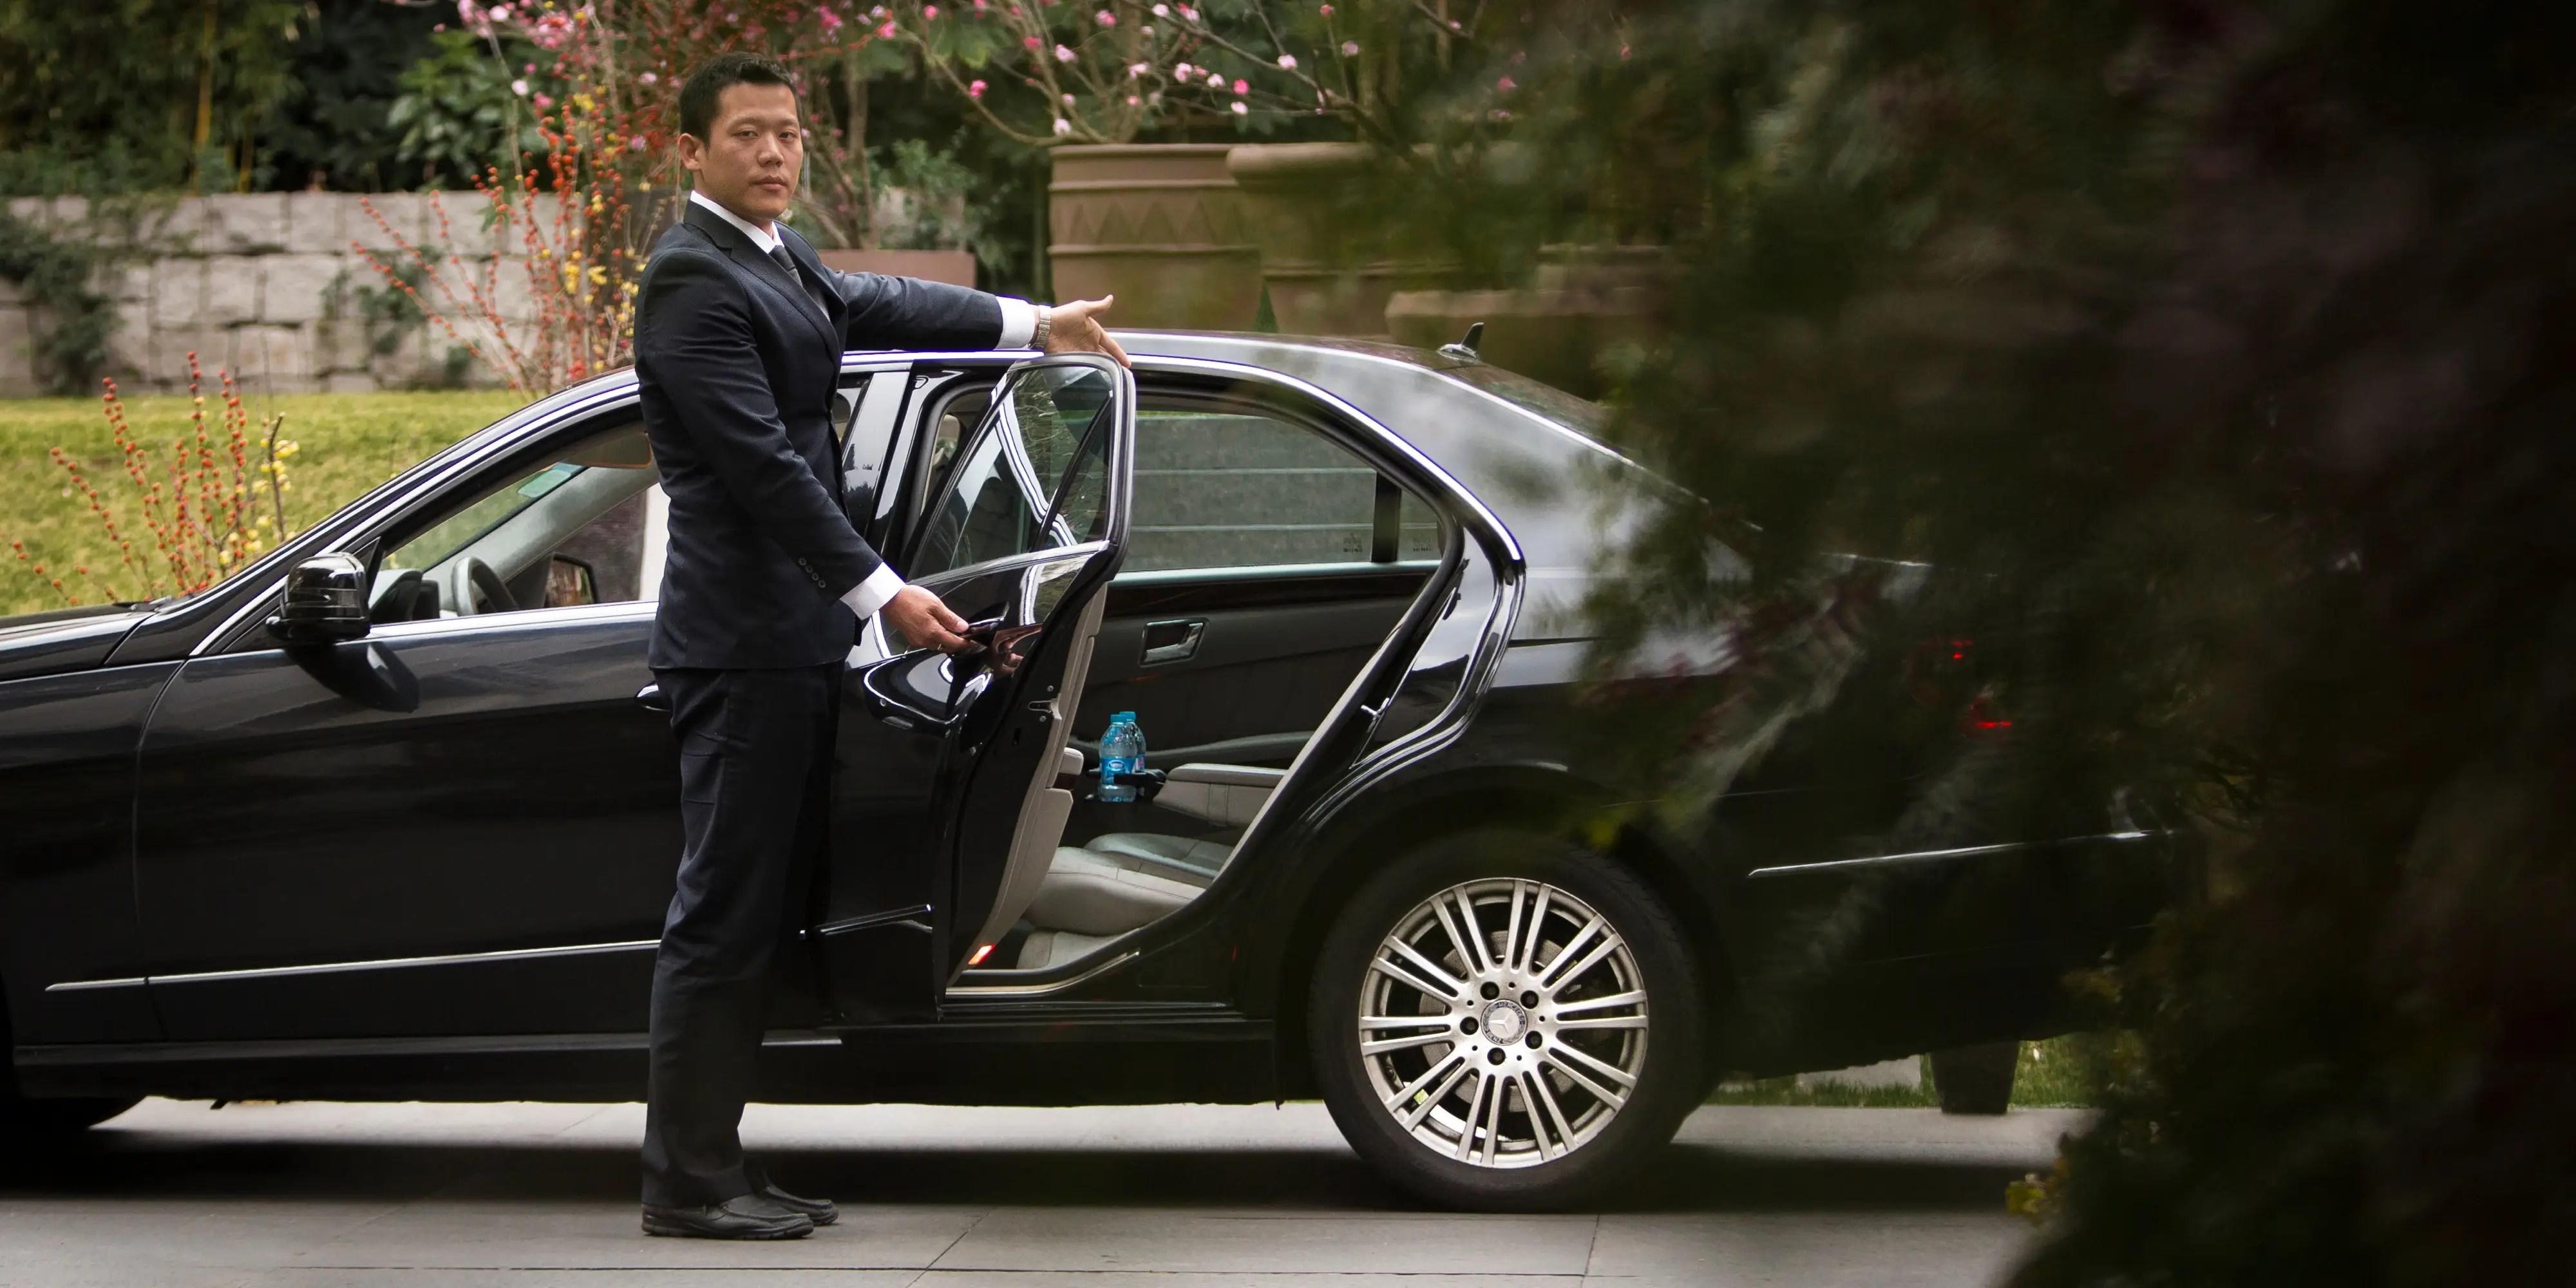 19. Drive Uber or Lyft